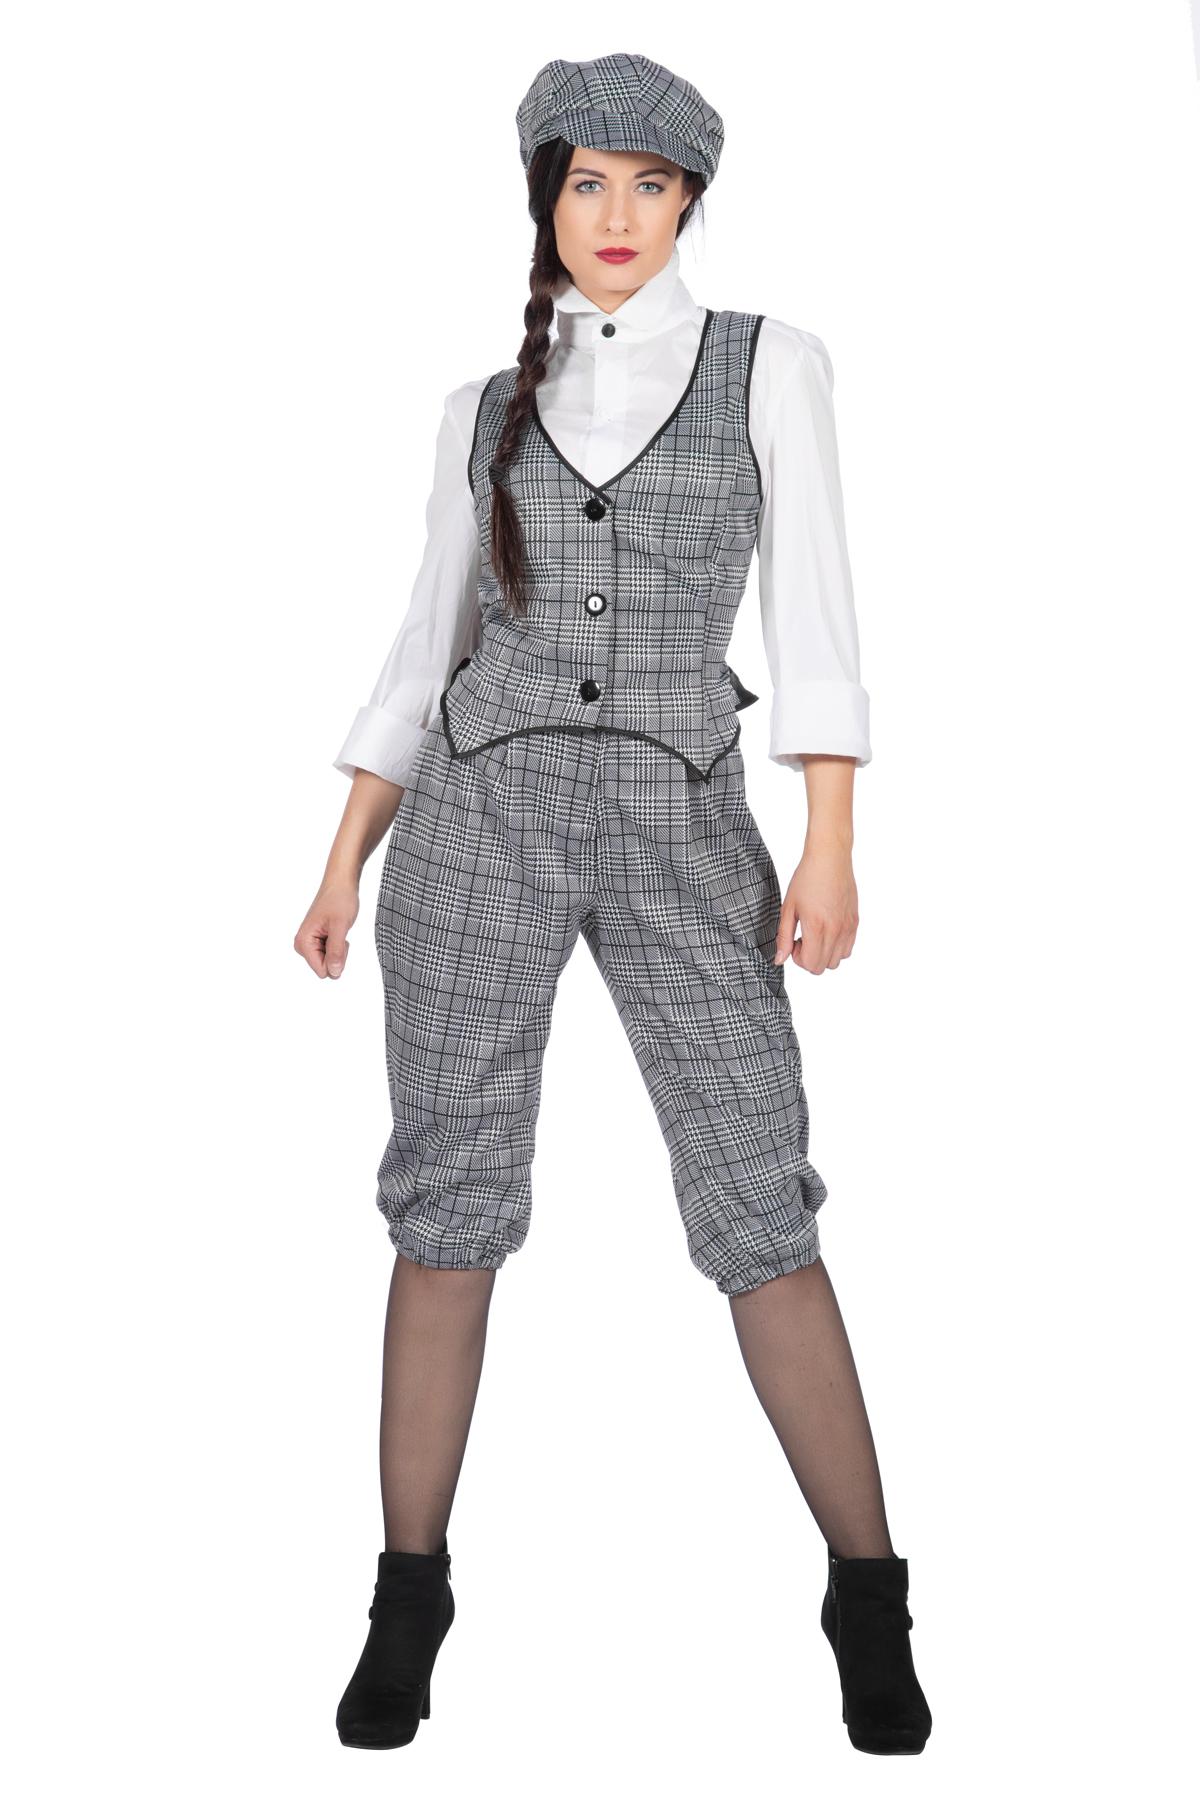 20er jahre mode jacke damen